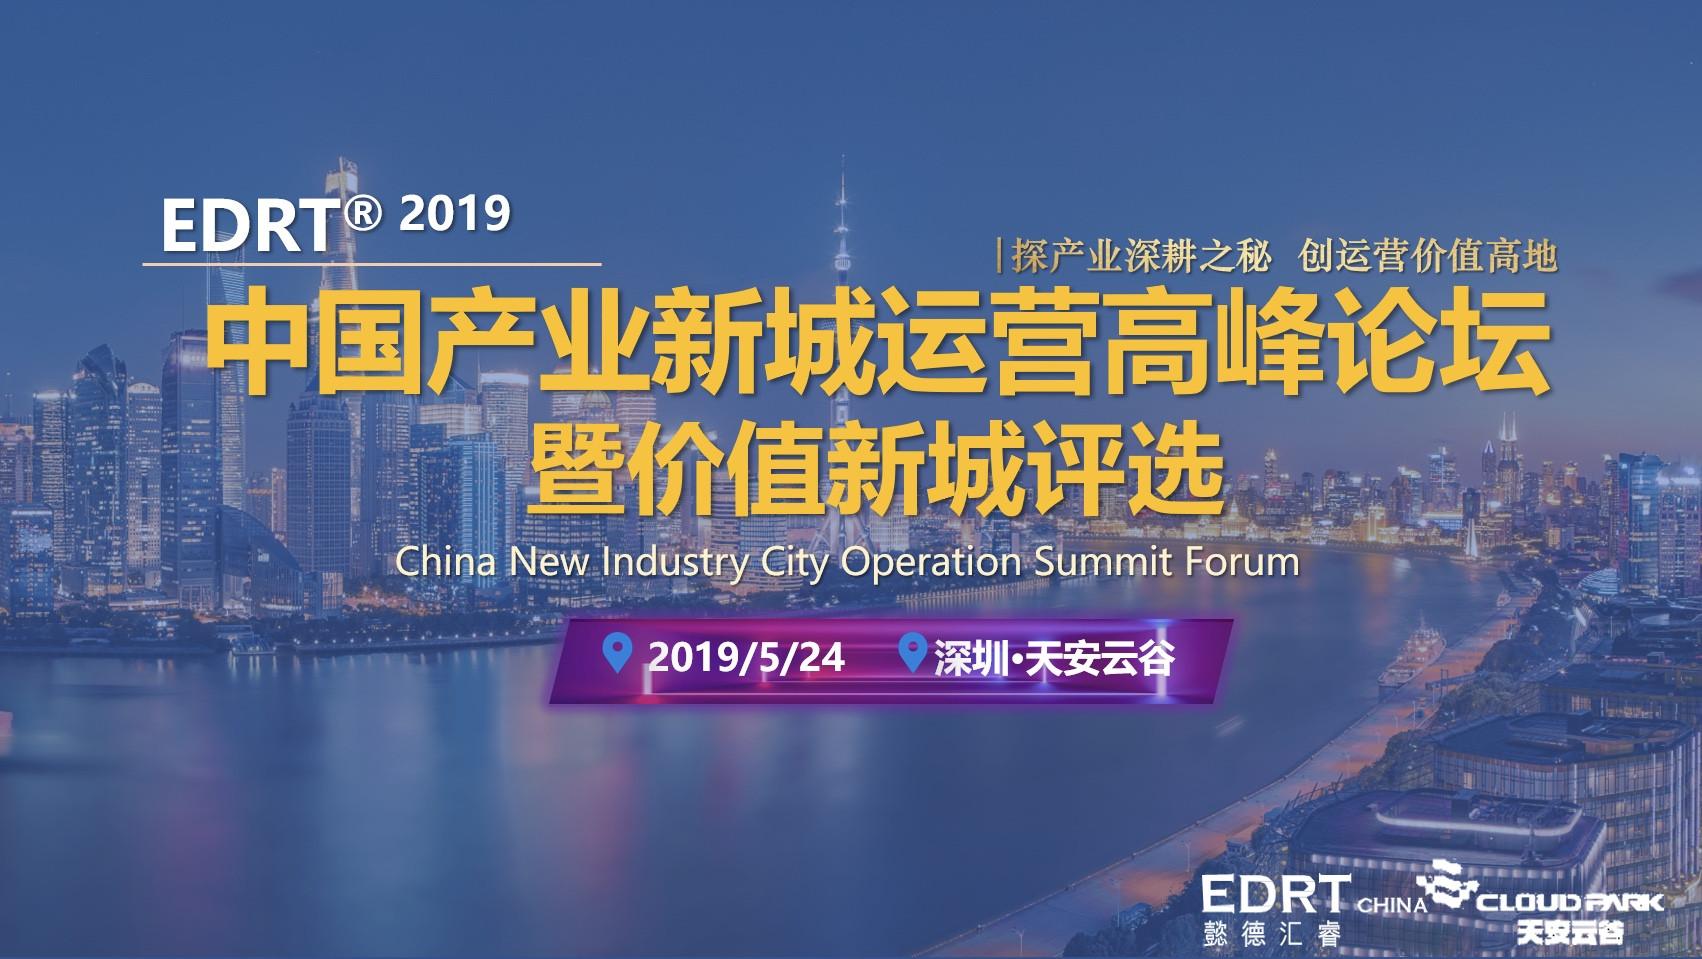 EDRT2019中国产业新城运营高峰论坛暨价值新城评选(深圳)